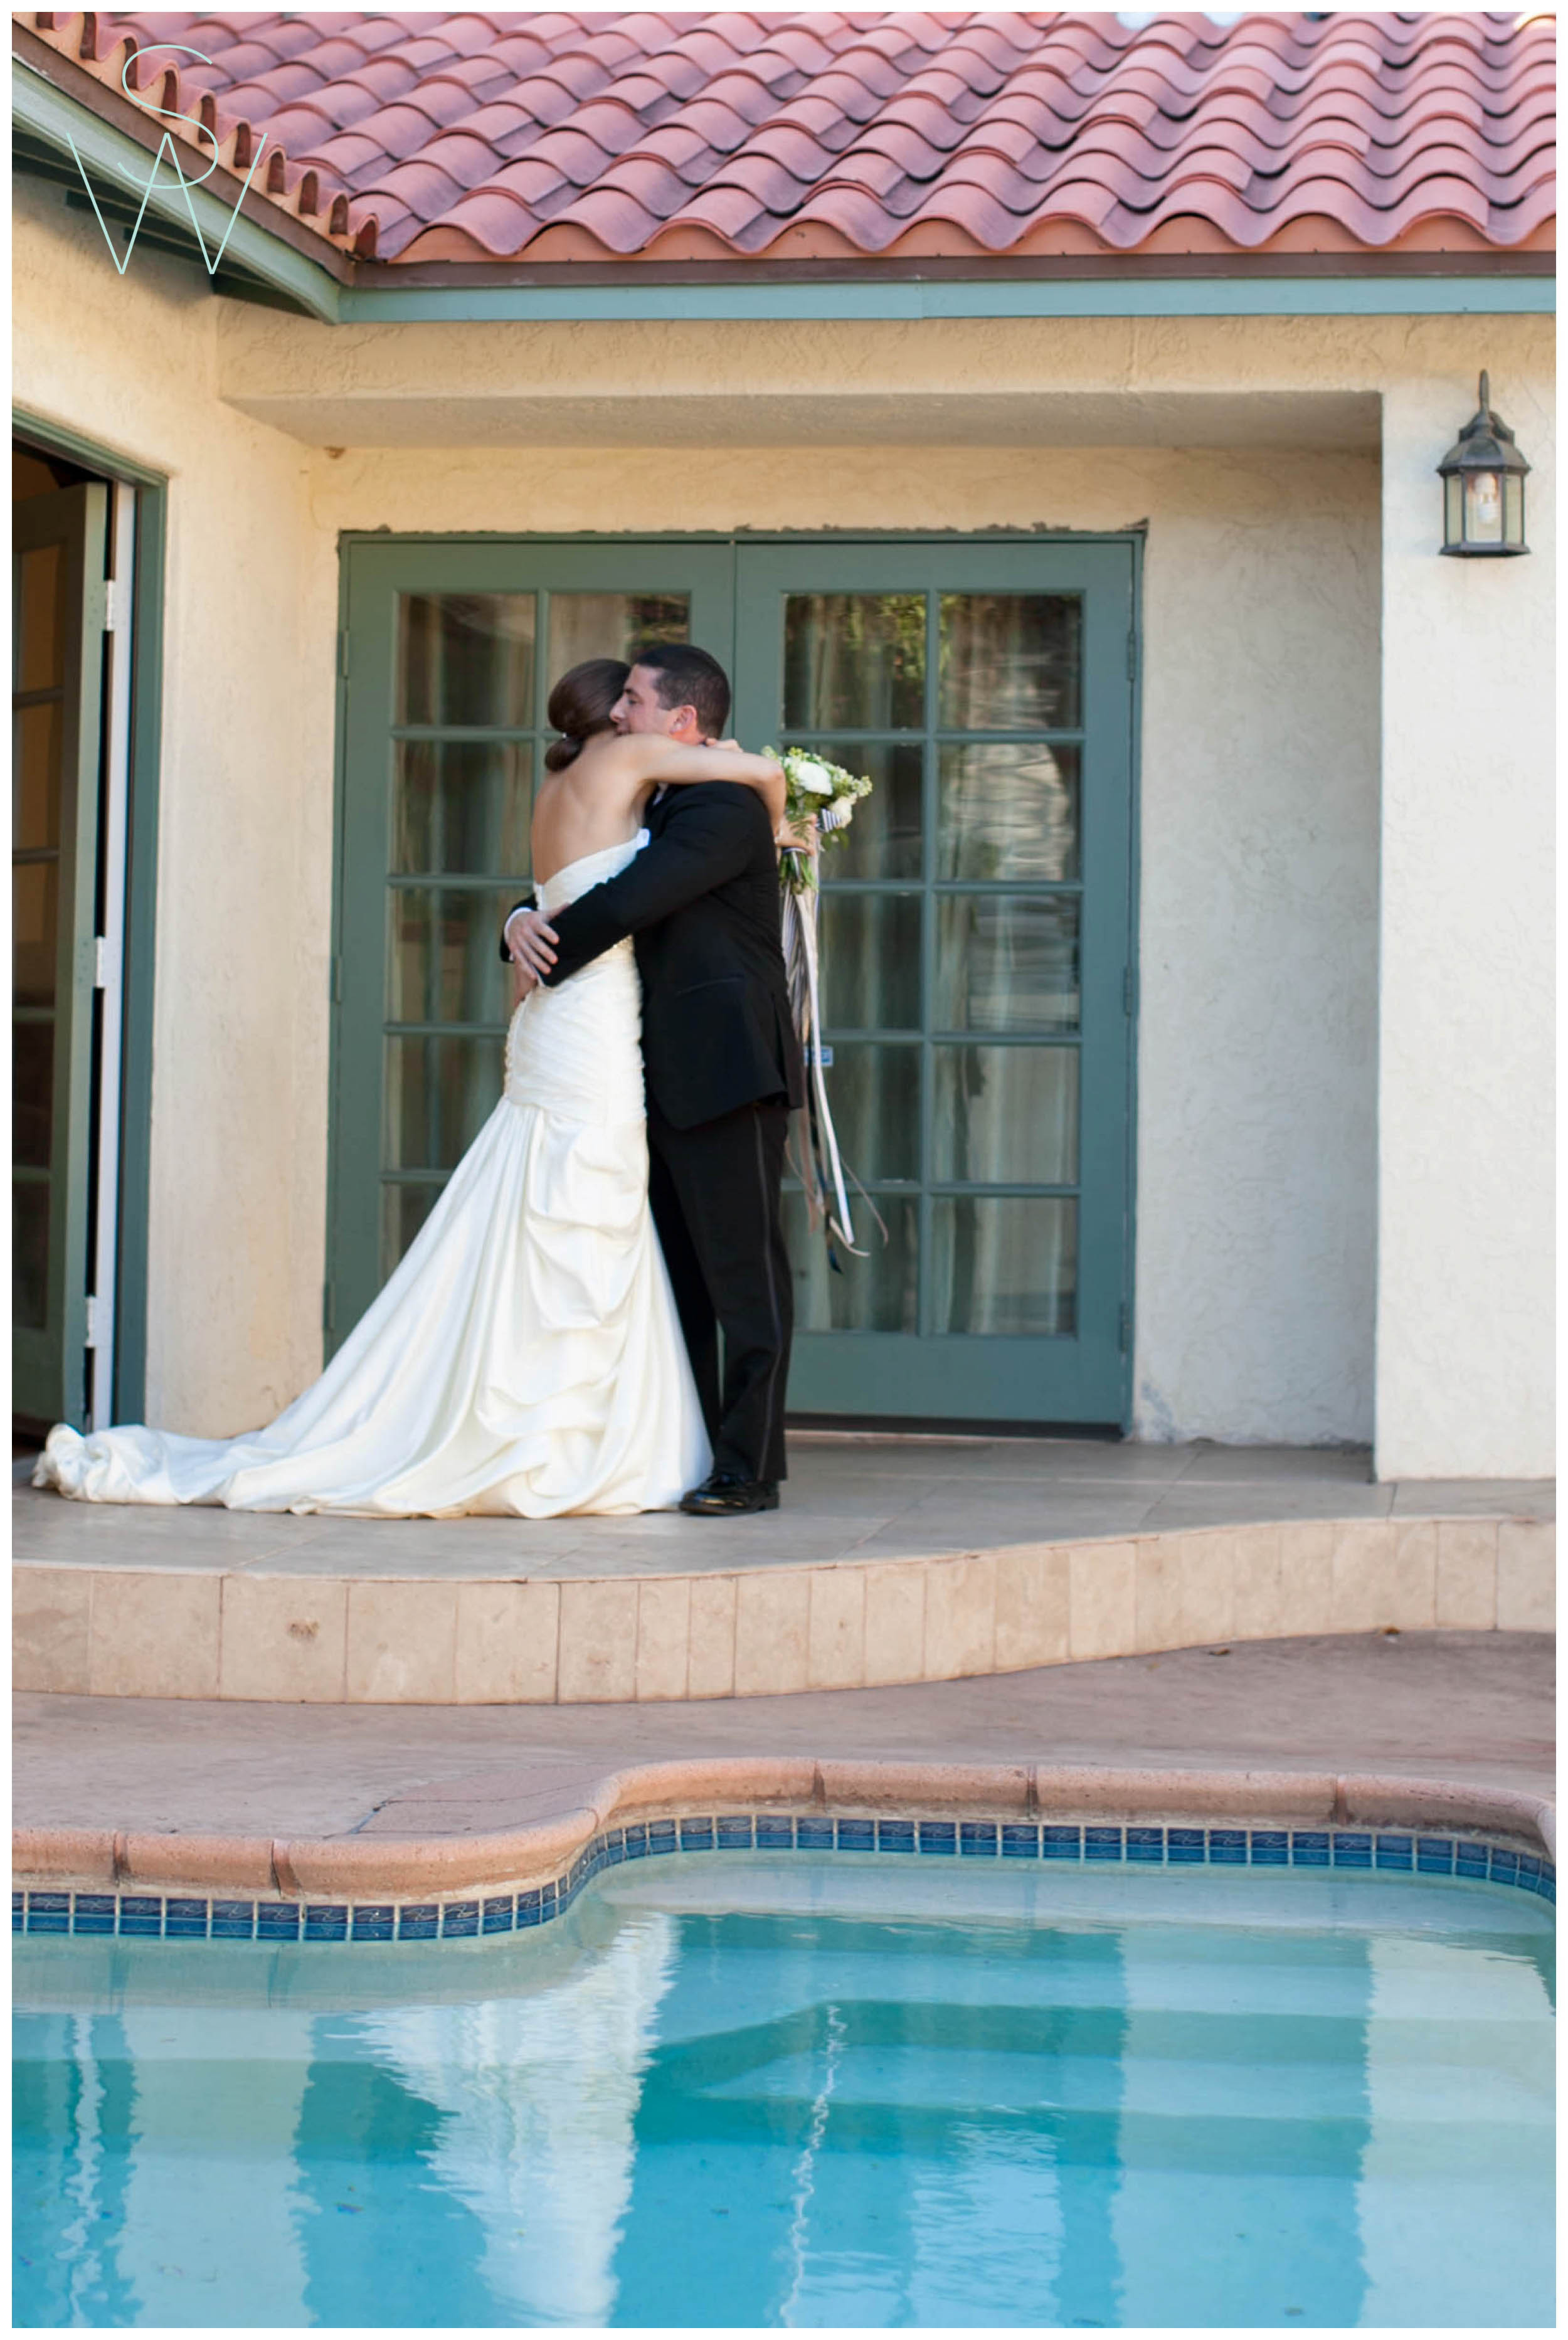 Shewanders.sdma_.wedding.photography-1018.jpg.wedding.photography-1018.jpg